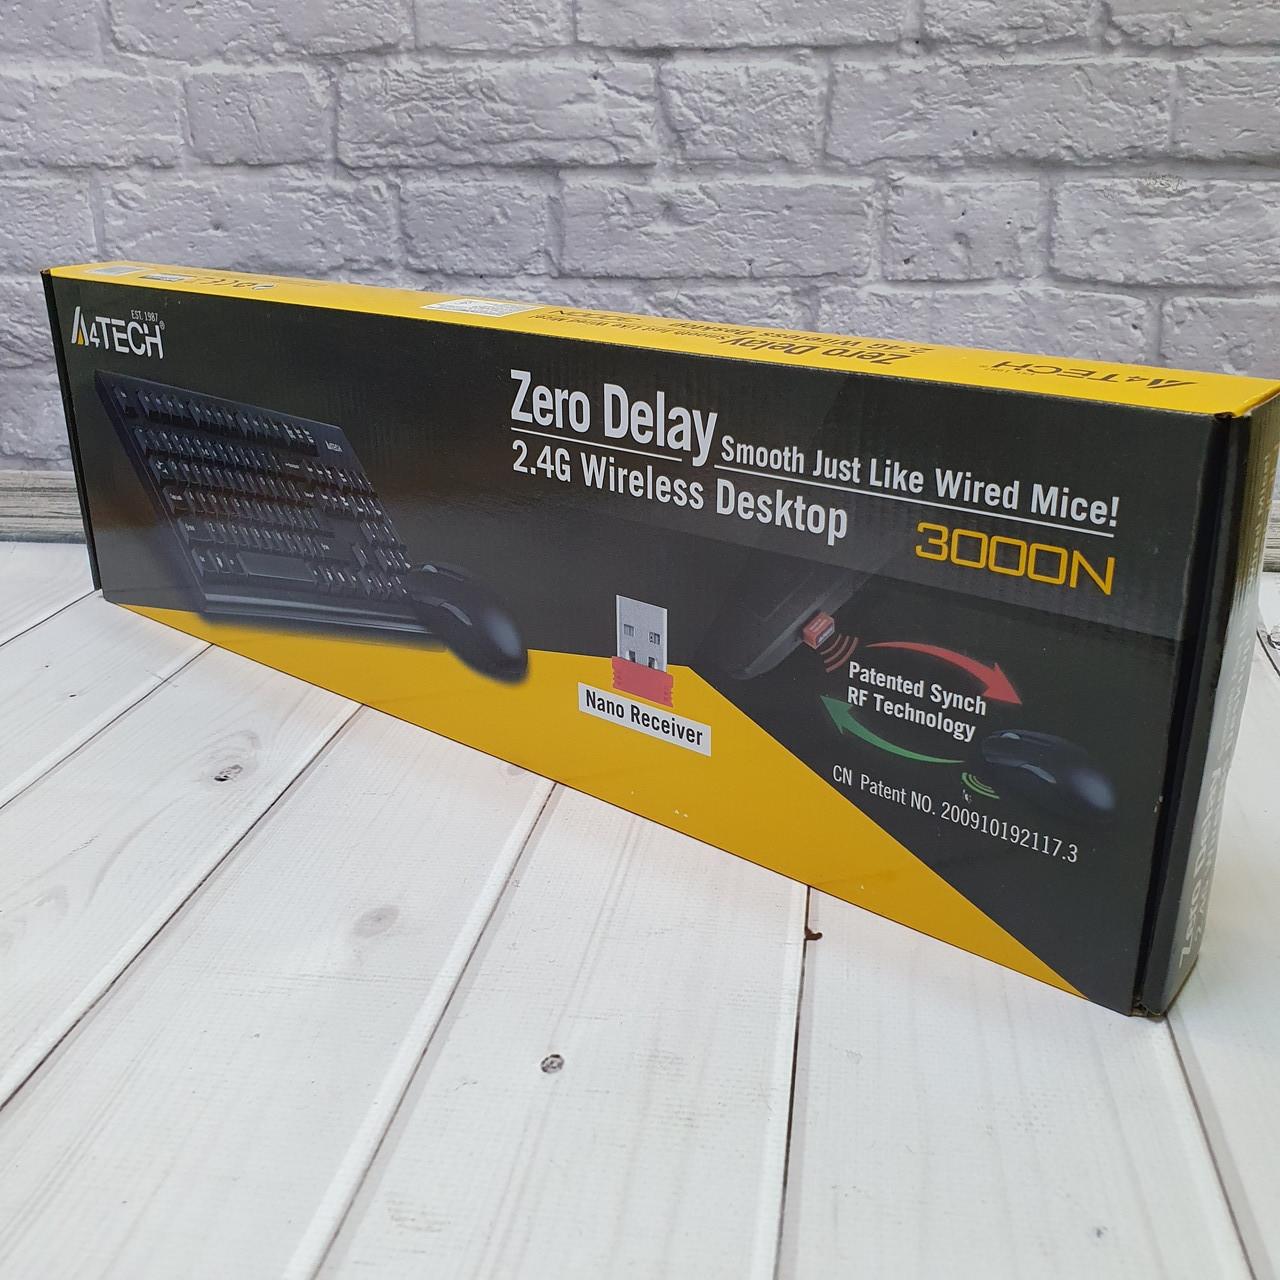 Беспроводные Клавиатуры  A4tech 3000N